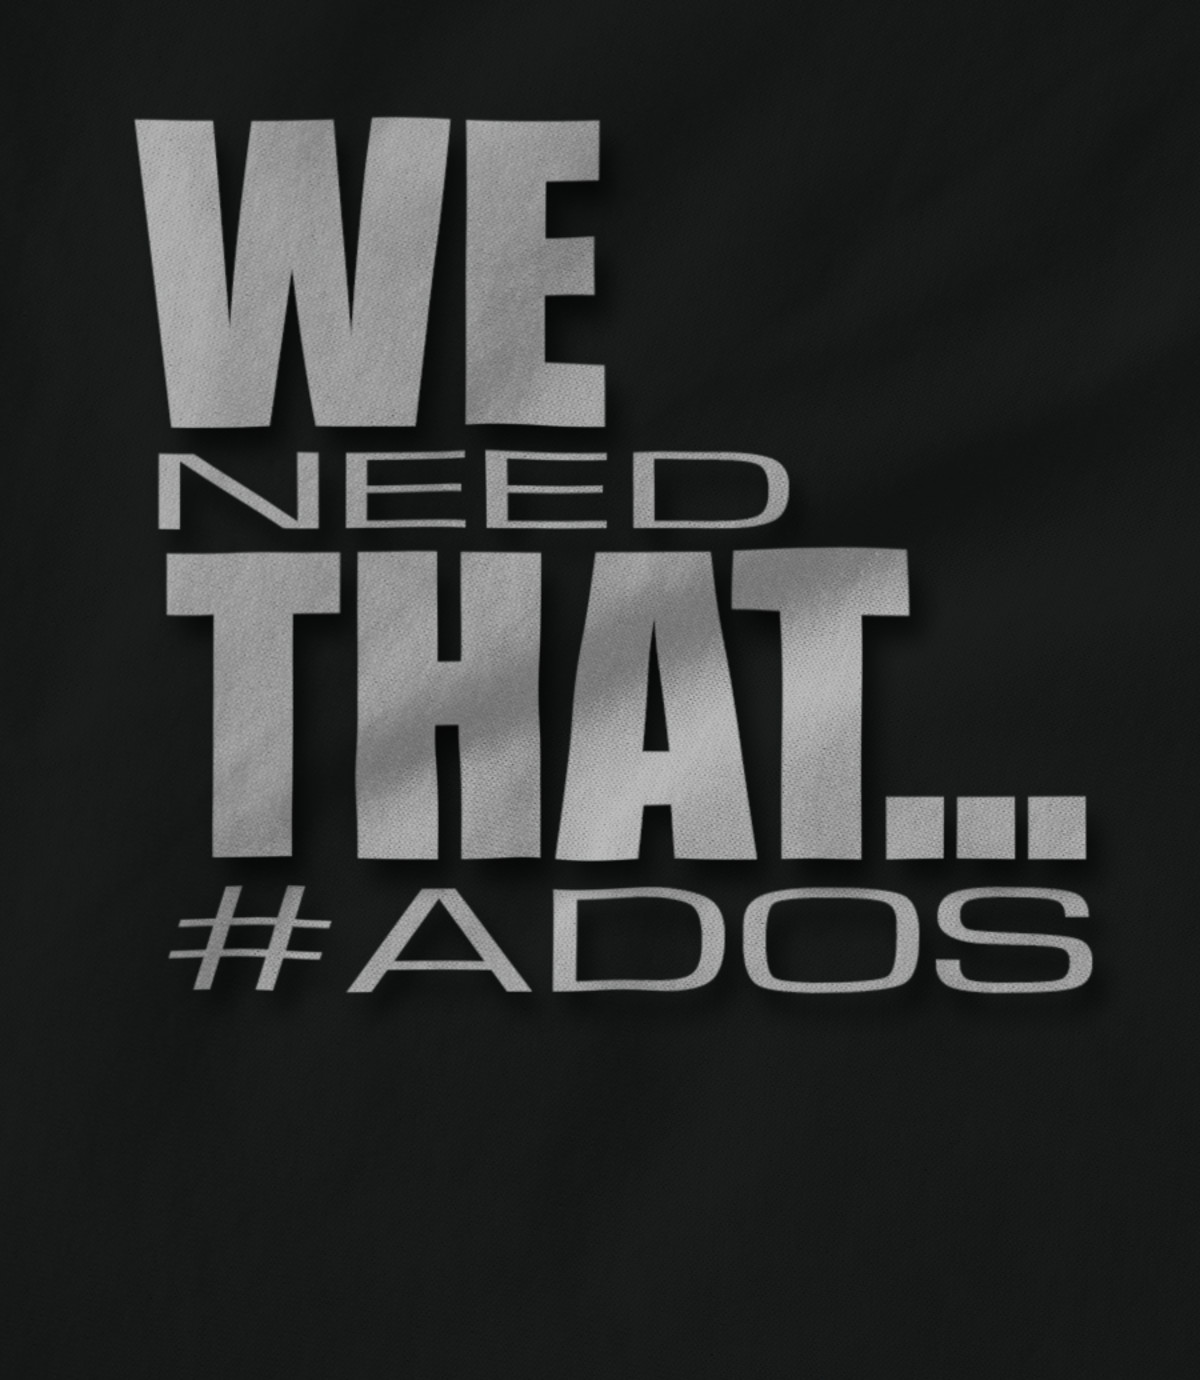 20 20 we need that     ados 1552776548